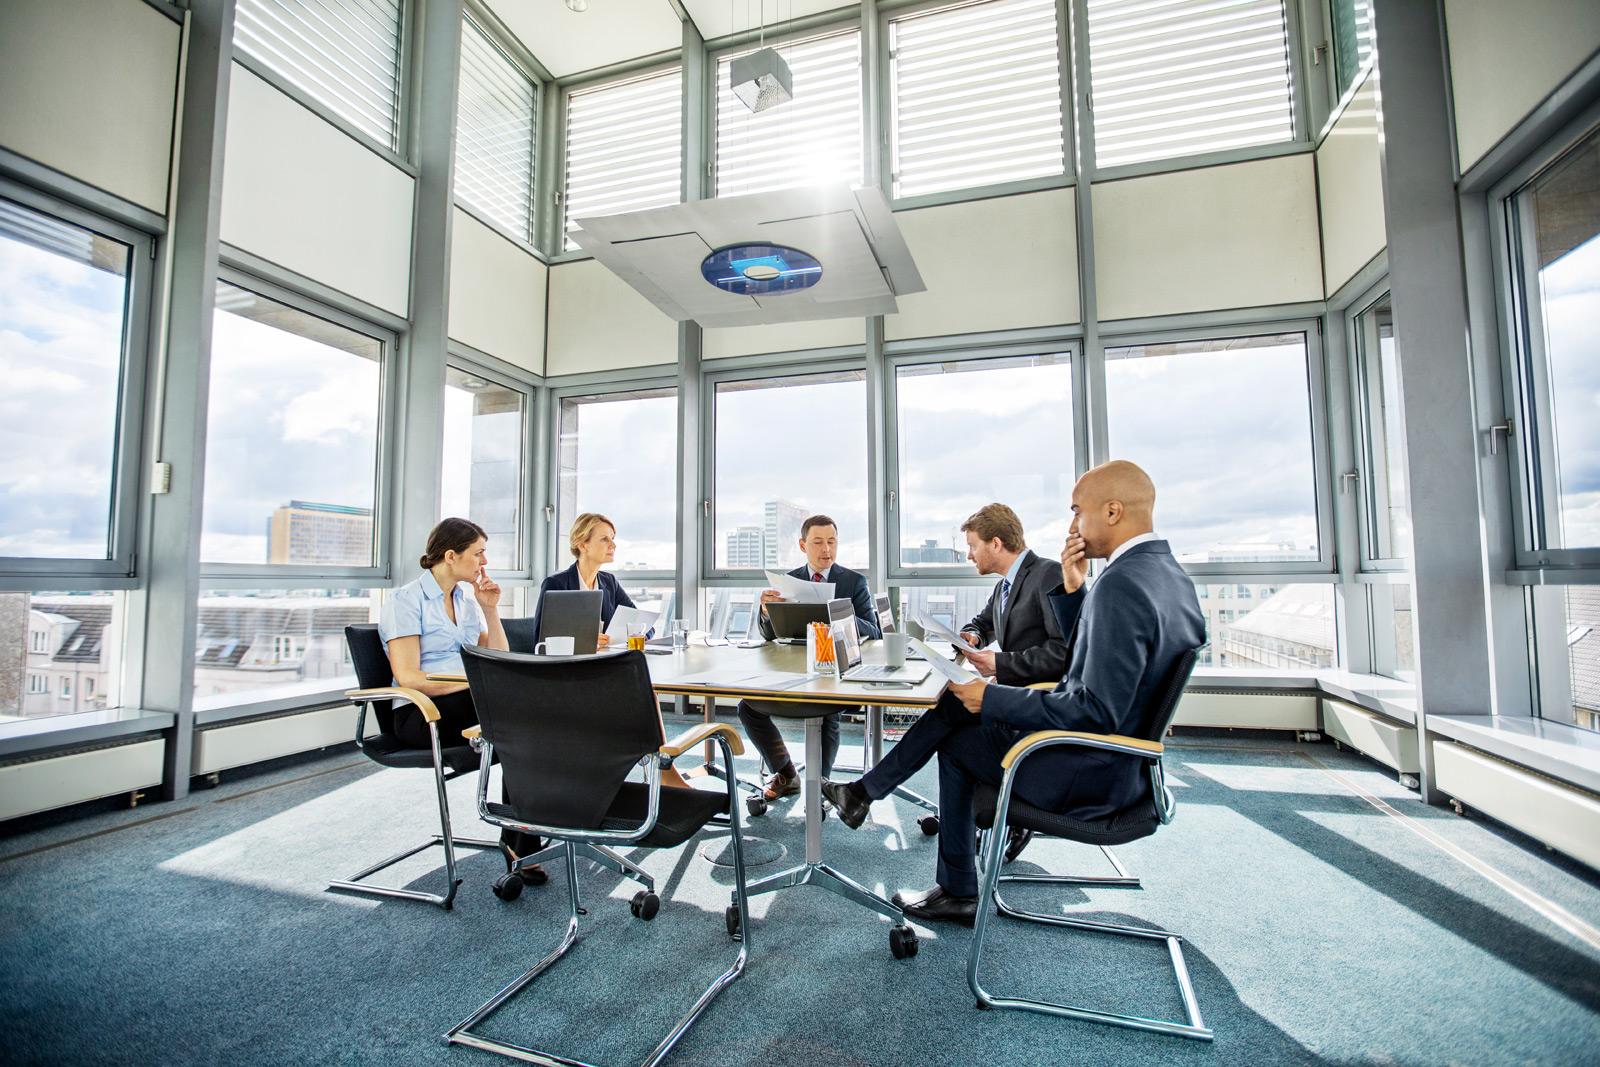 Marktpartner | Stromversorgung Seebruck eG (Symbolfoto) | iStock.com/alvarez